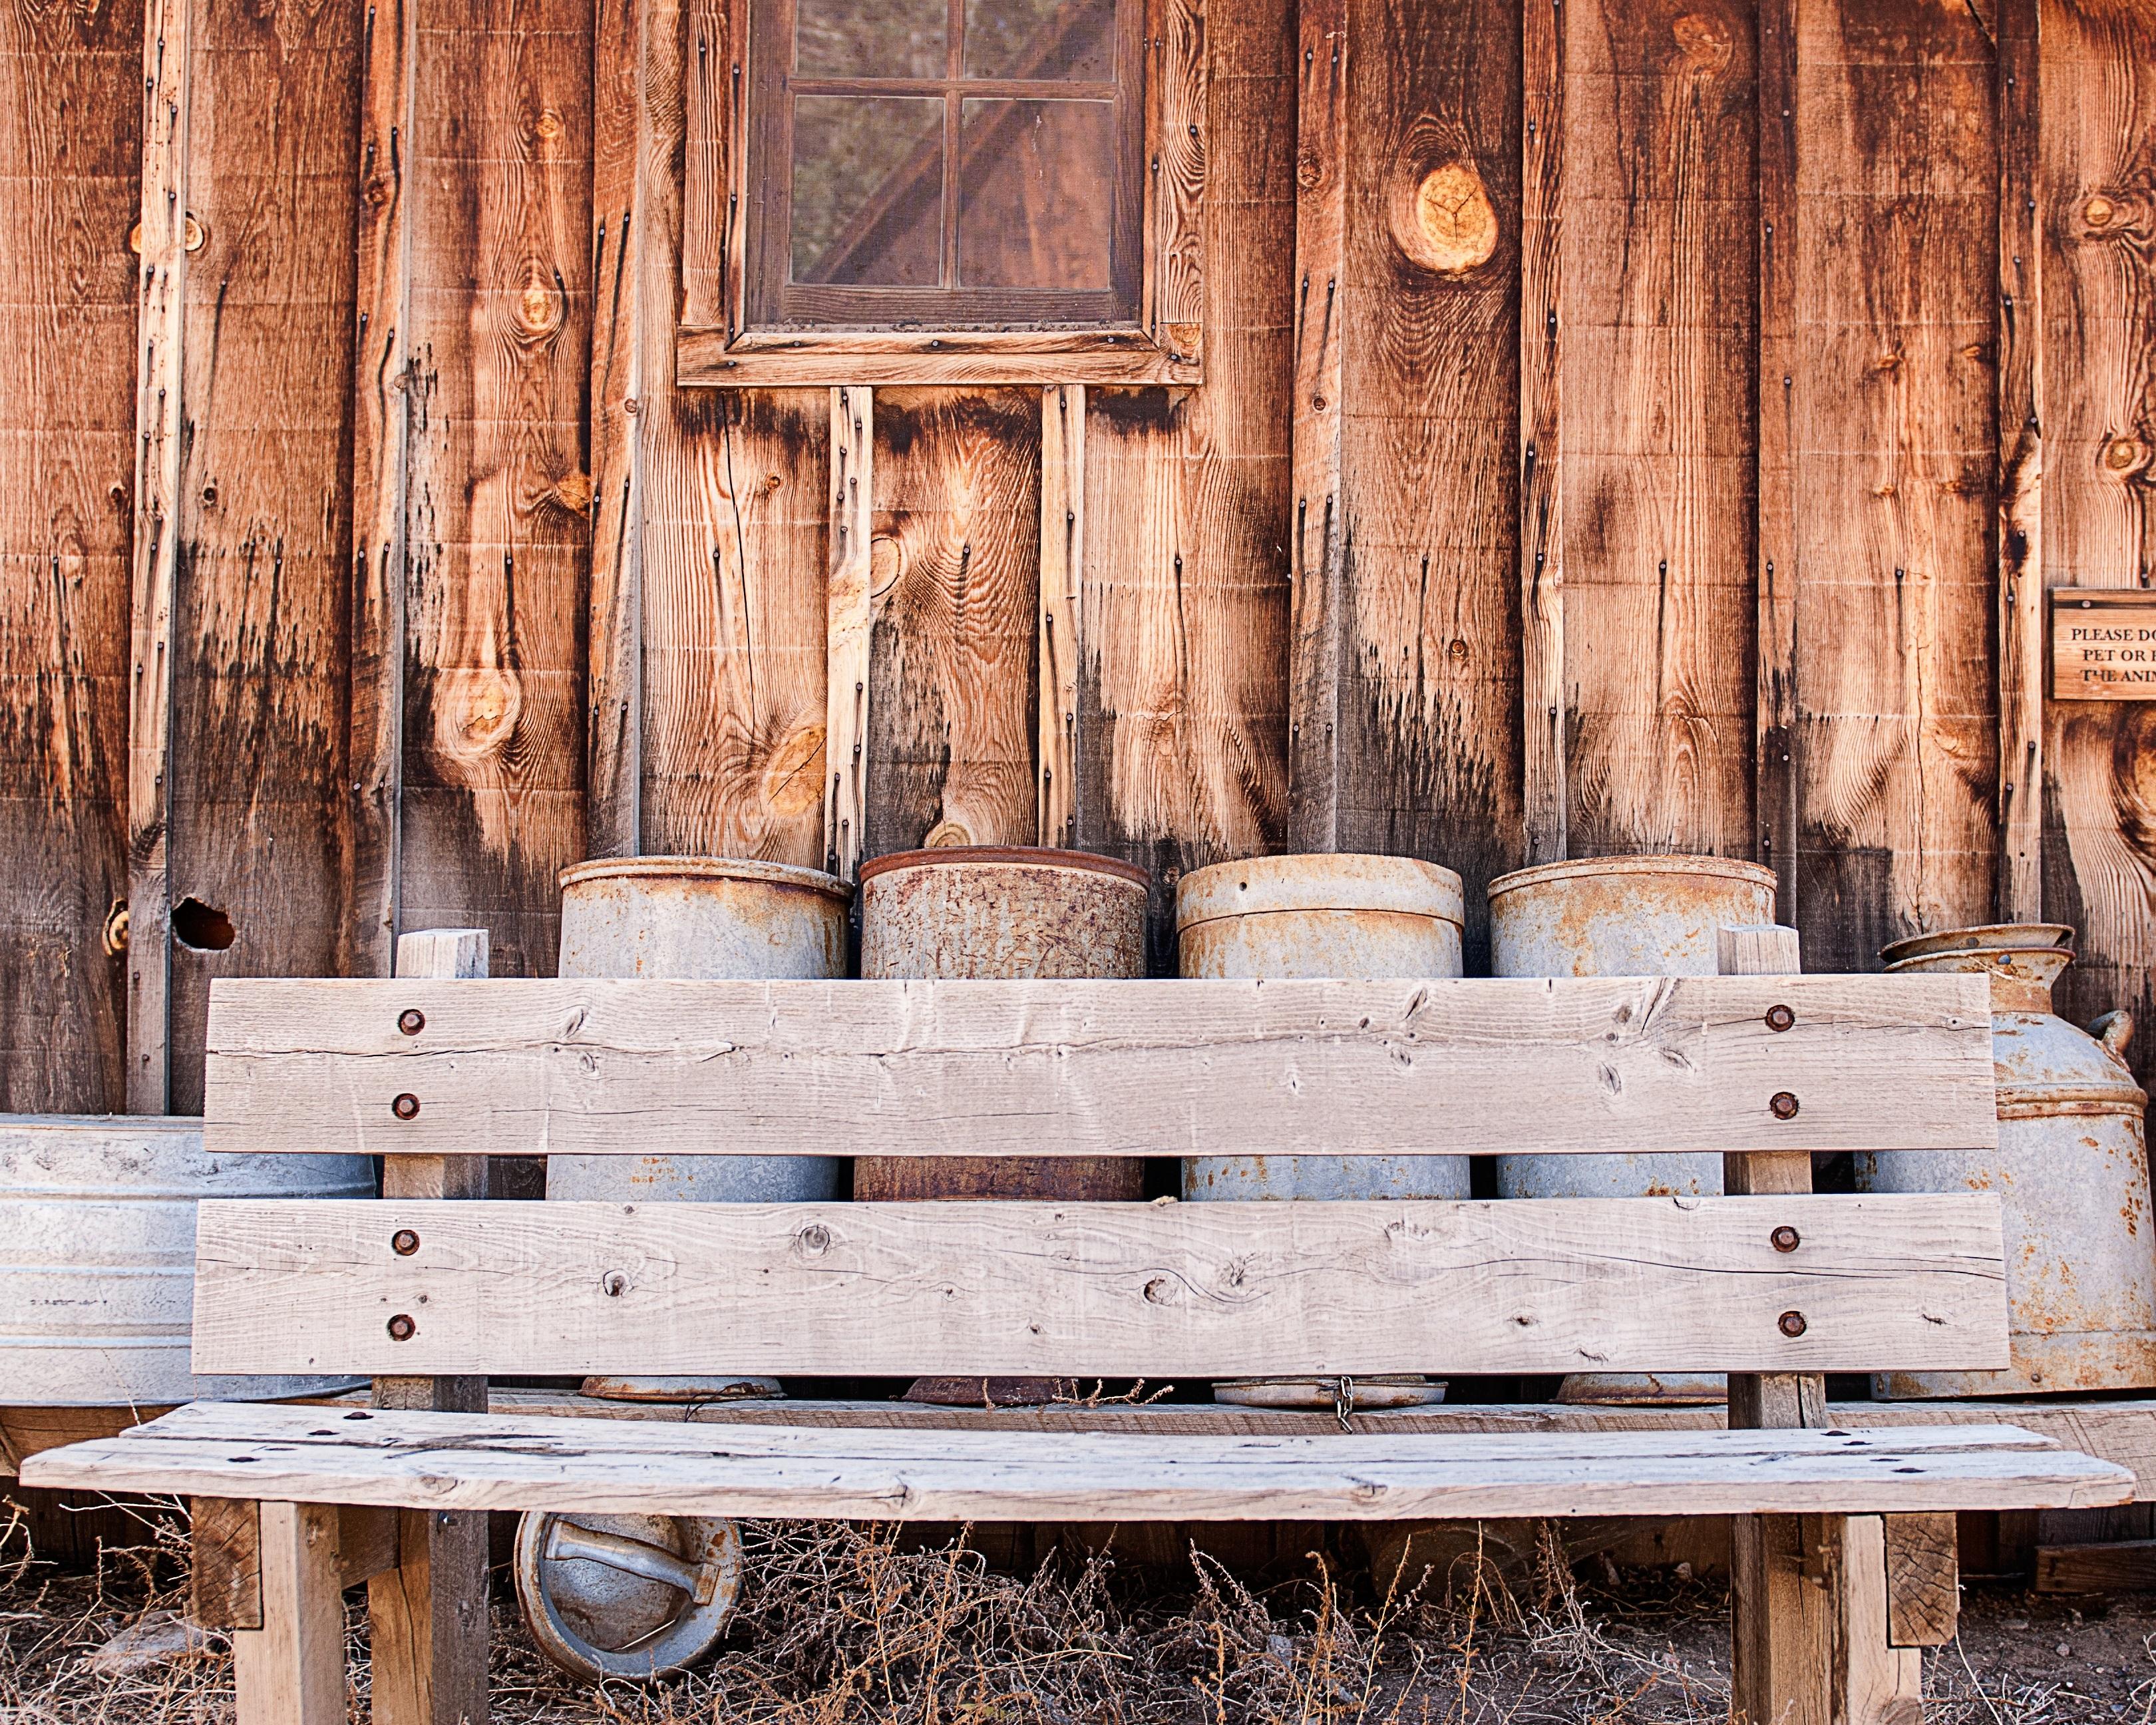 Fotos gratis : banco, vendimia, antiguo, granero, pared, rústico ...